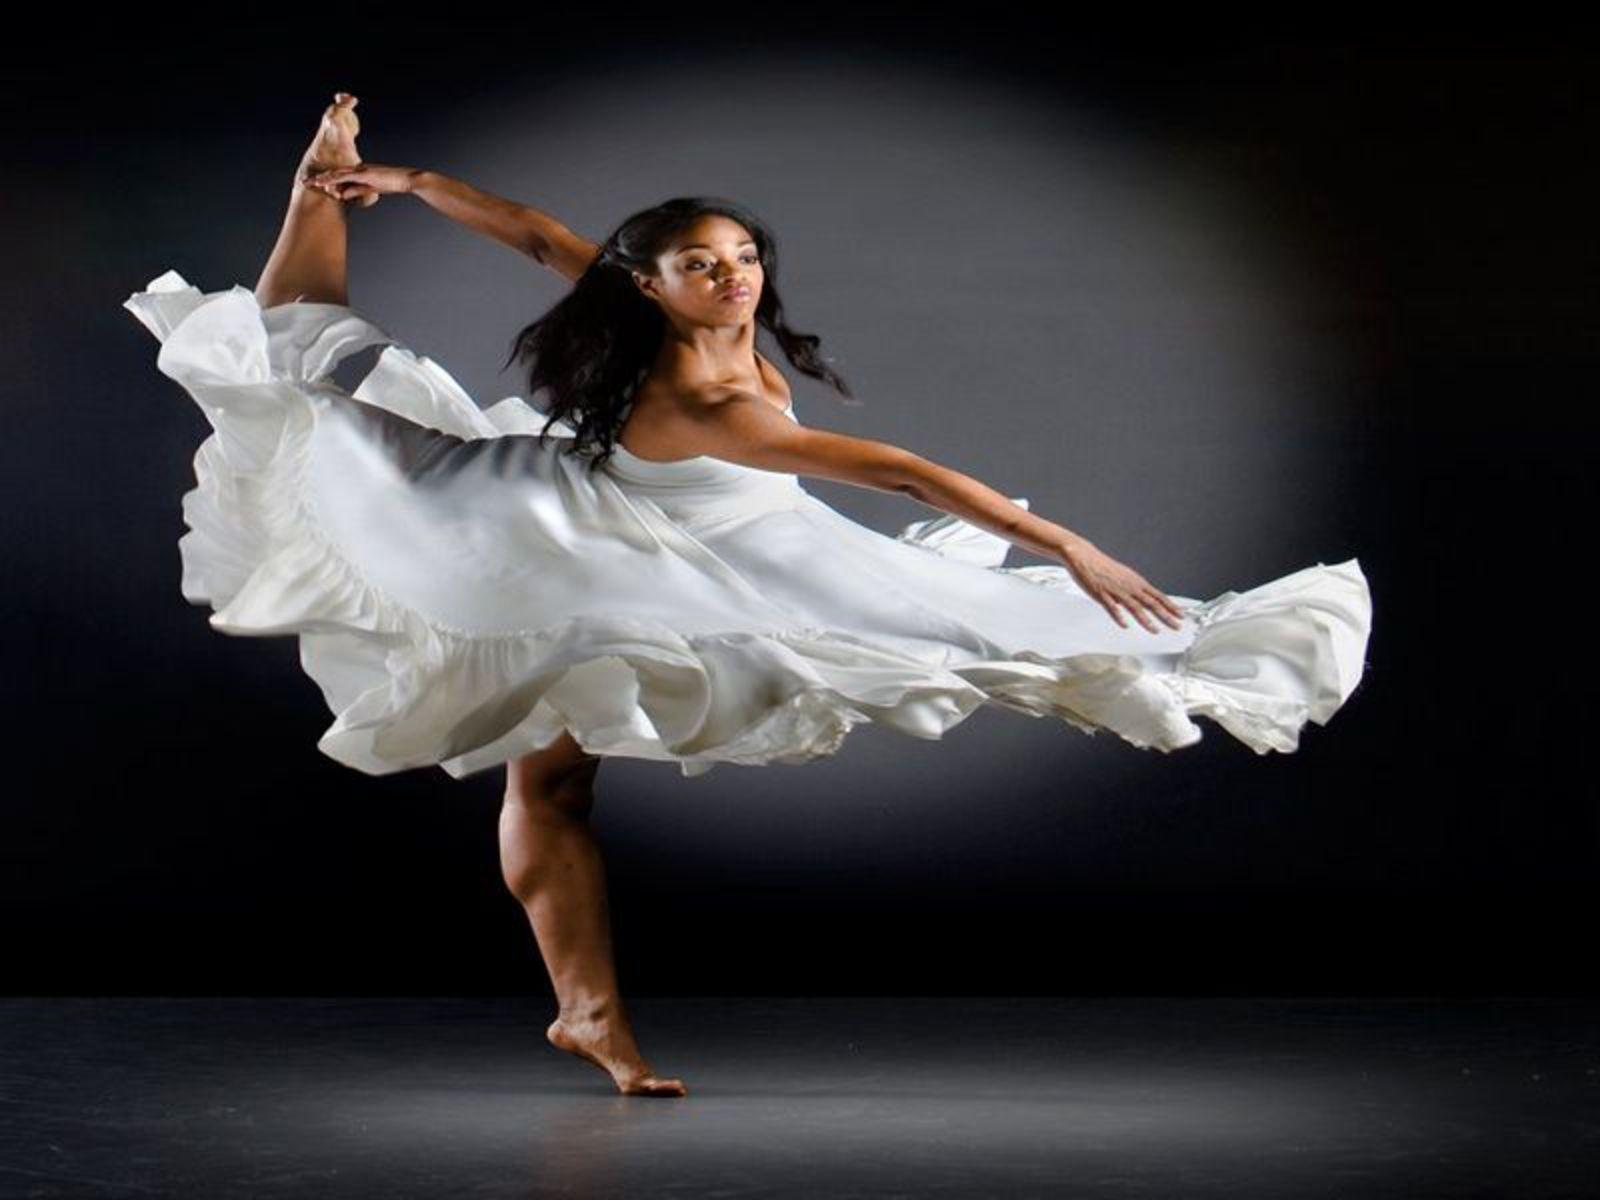 Bailarina Ballet Wallpaper 1600x1200